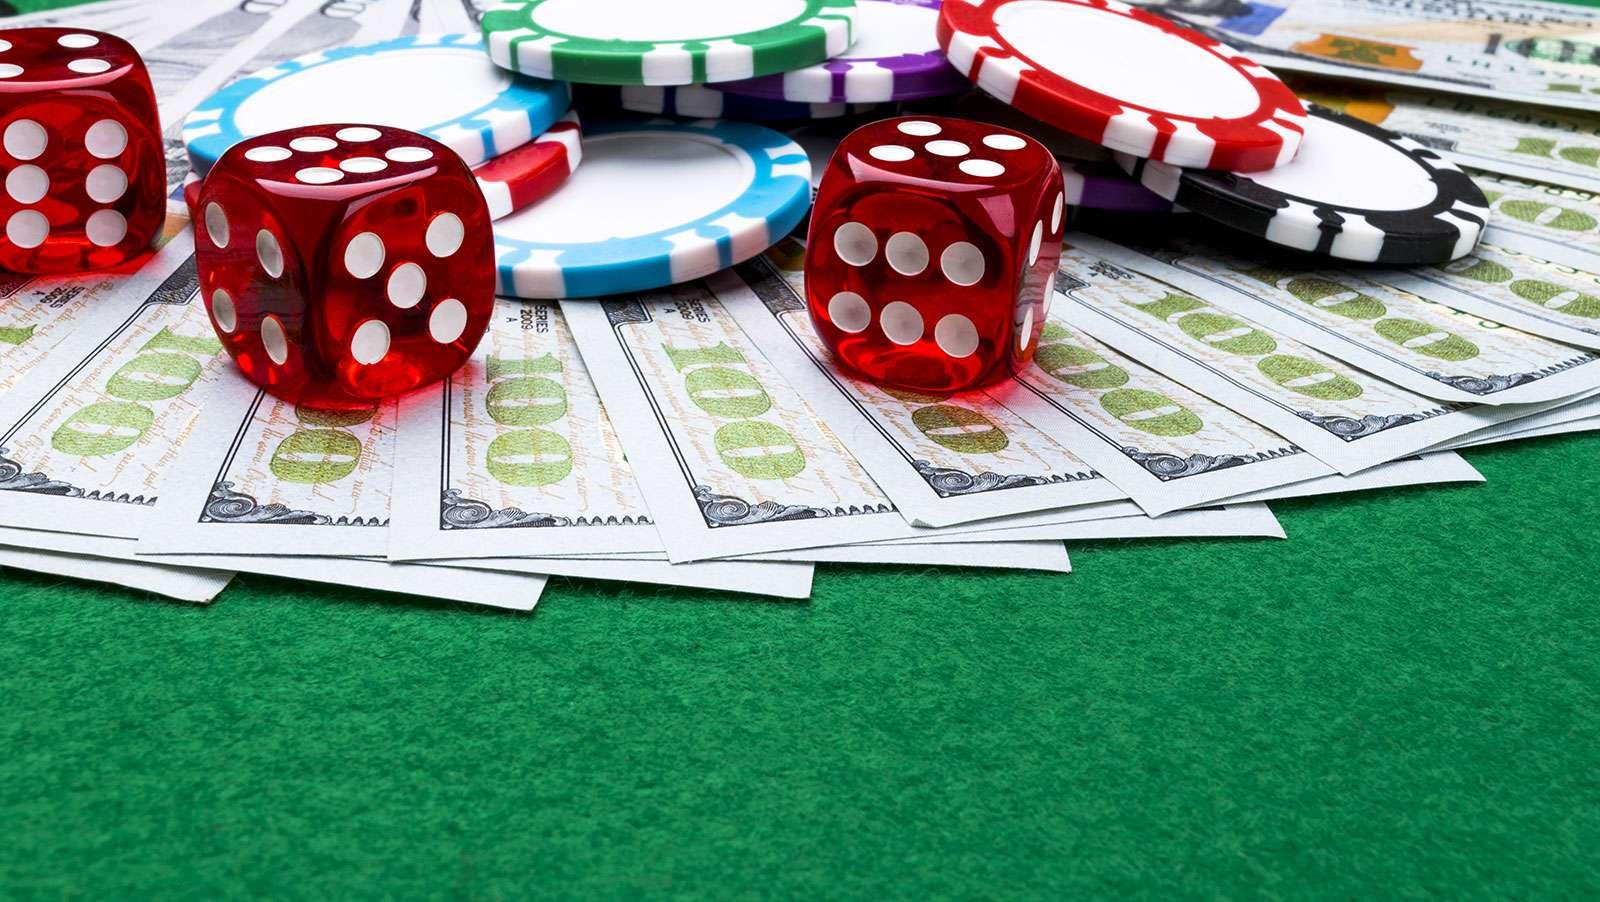 European Poker Tour Barcelona - Escorts de lujo para el European Poker Tour Barcelona